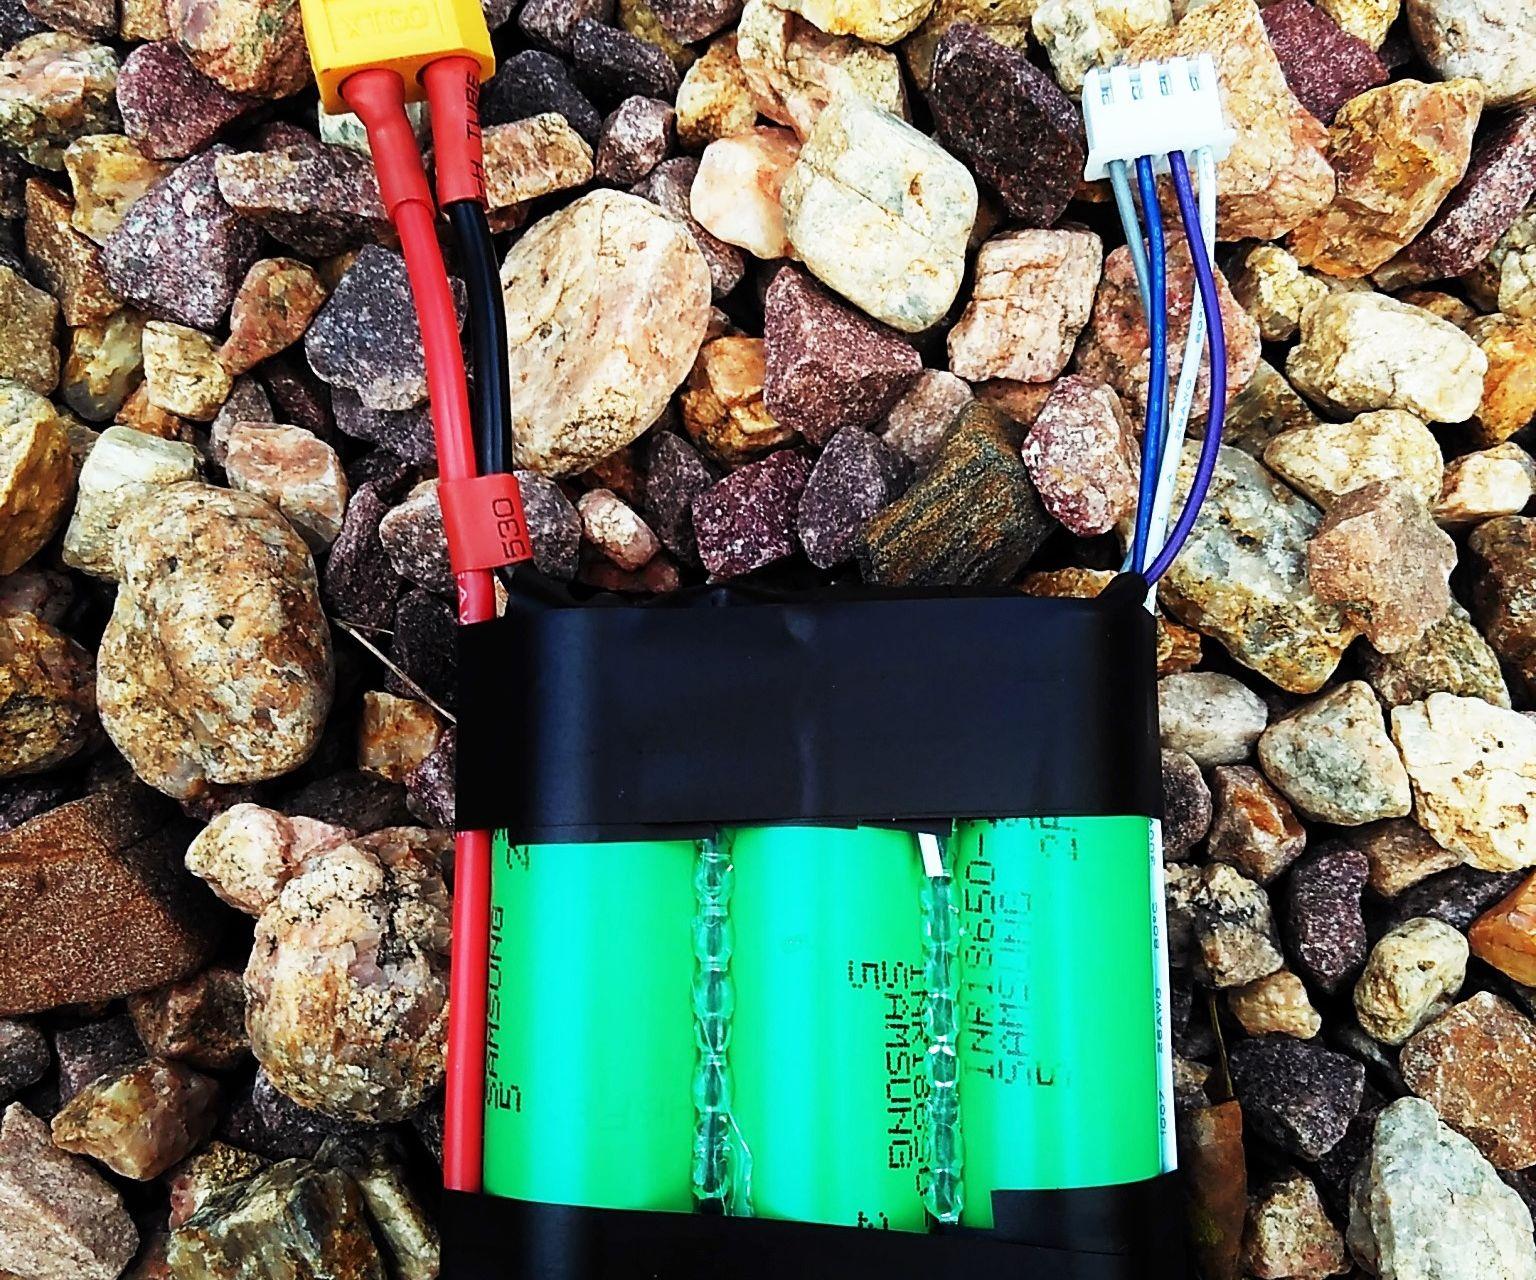 DIY 18650 RC Battery